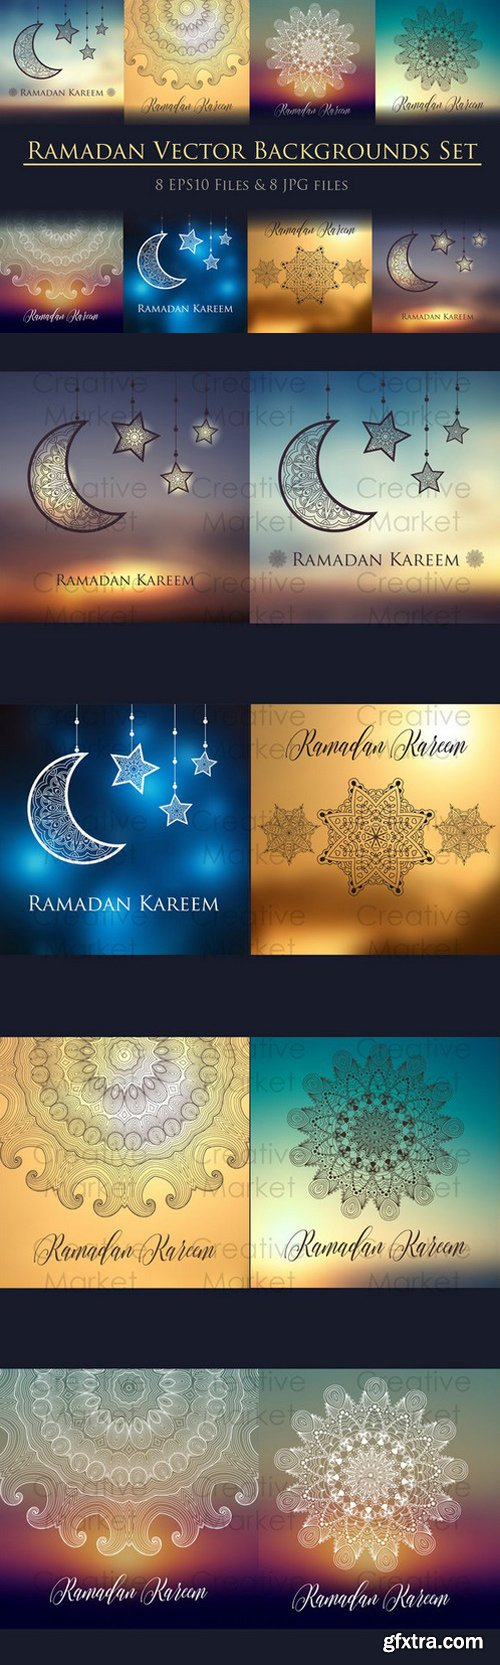 CM - 8 Ramadan backgrounds vector set 703856